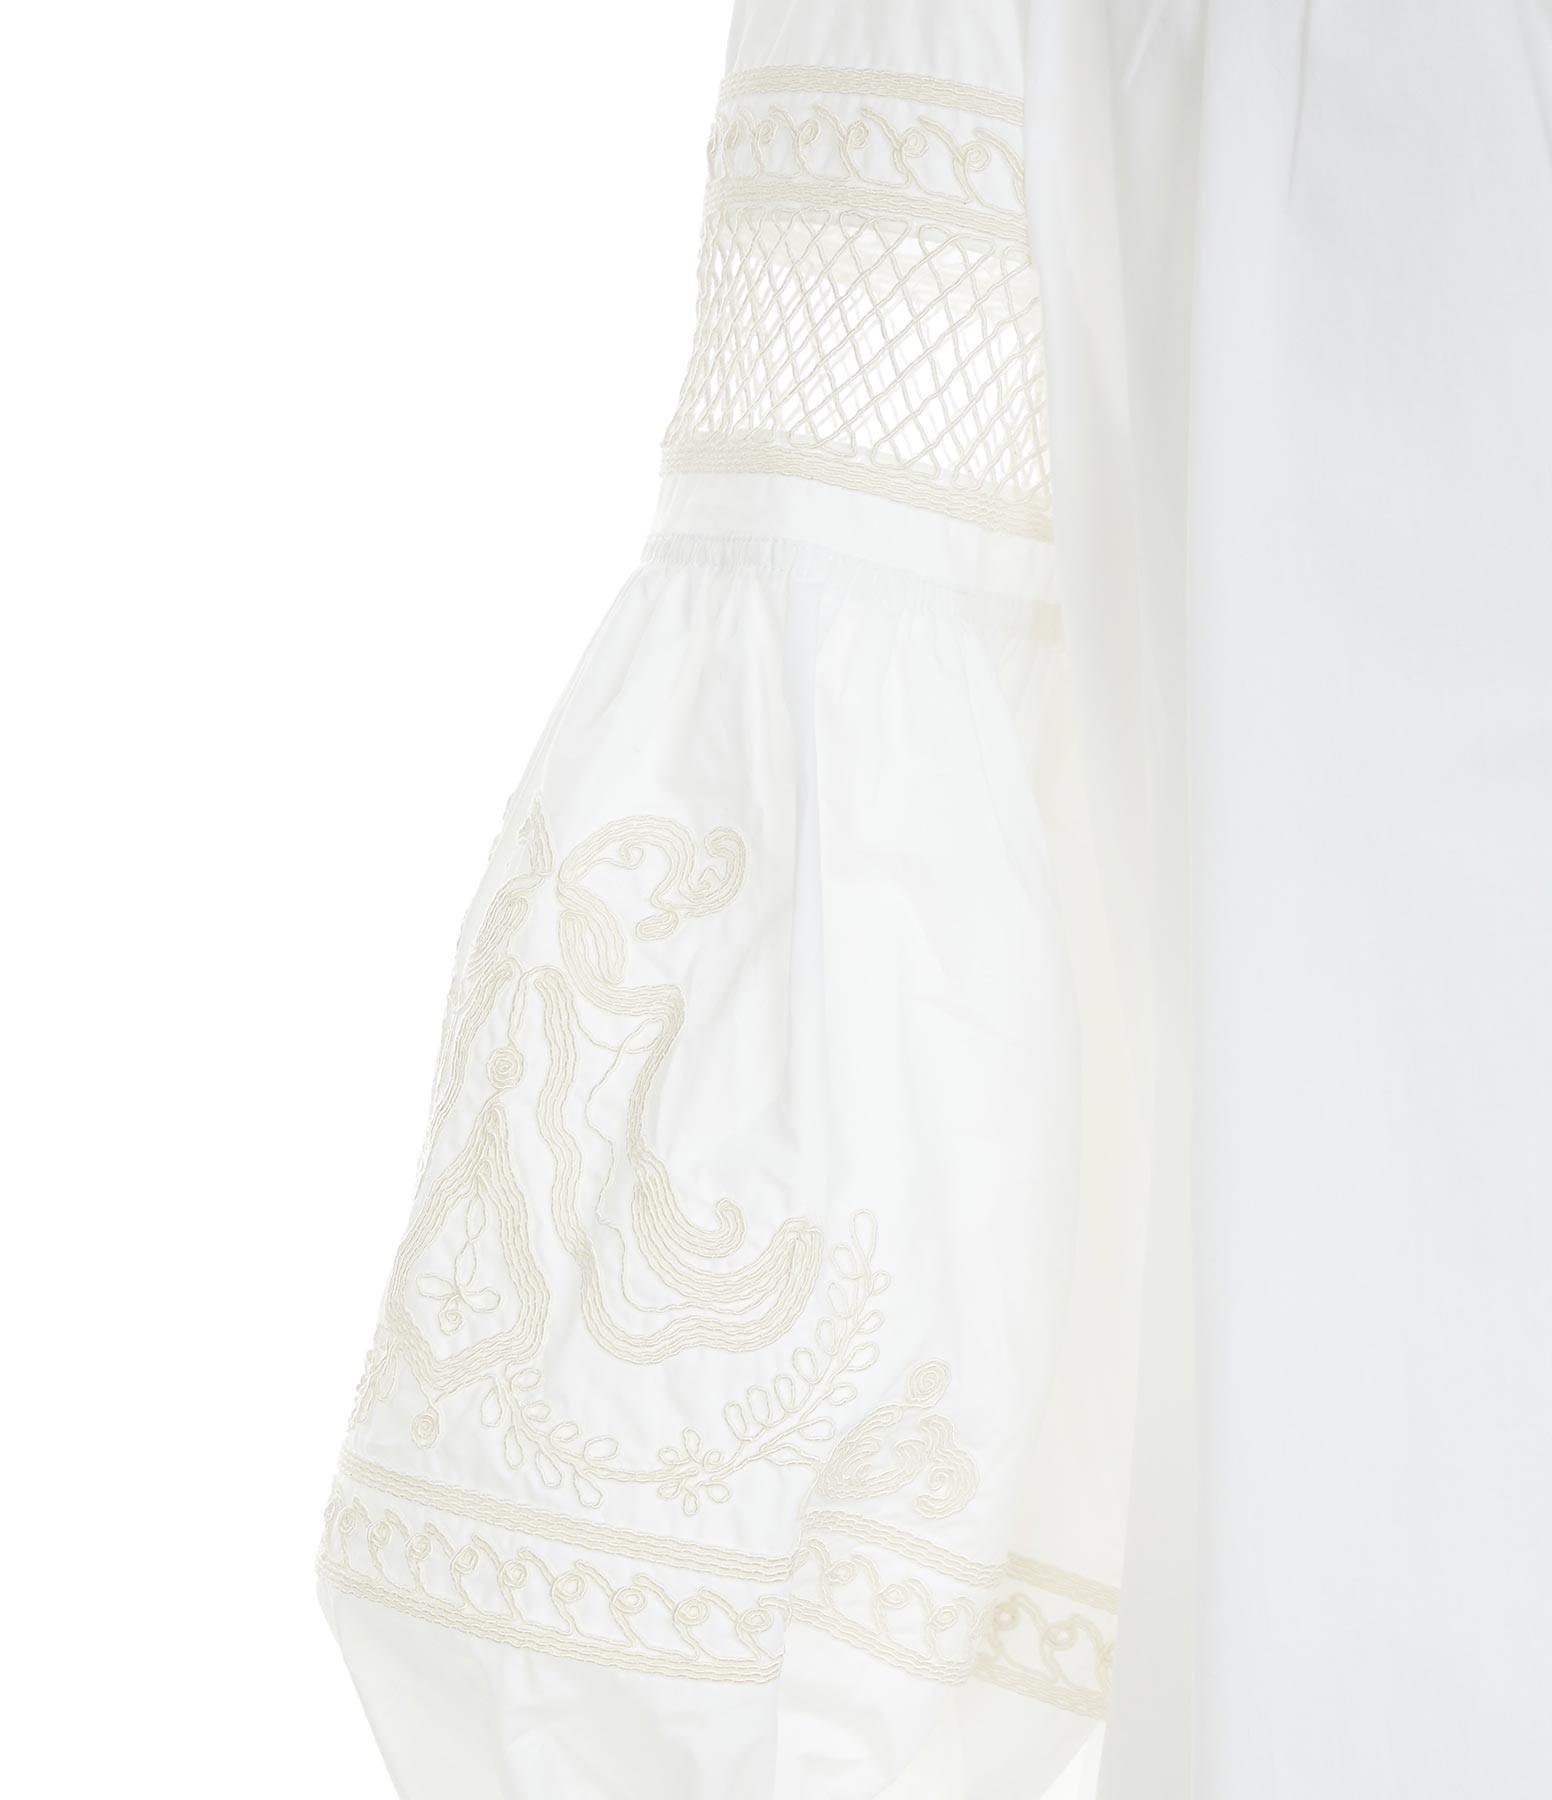 ROBERTO COLLINA - Caftan Long Coton Broderie Blanc